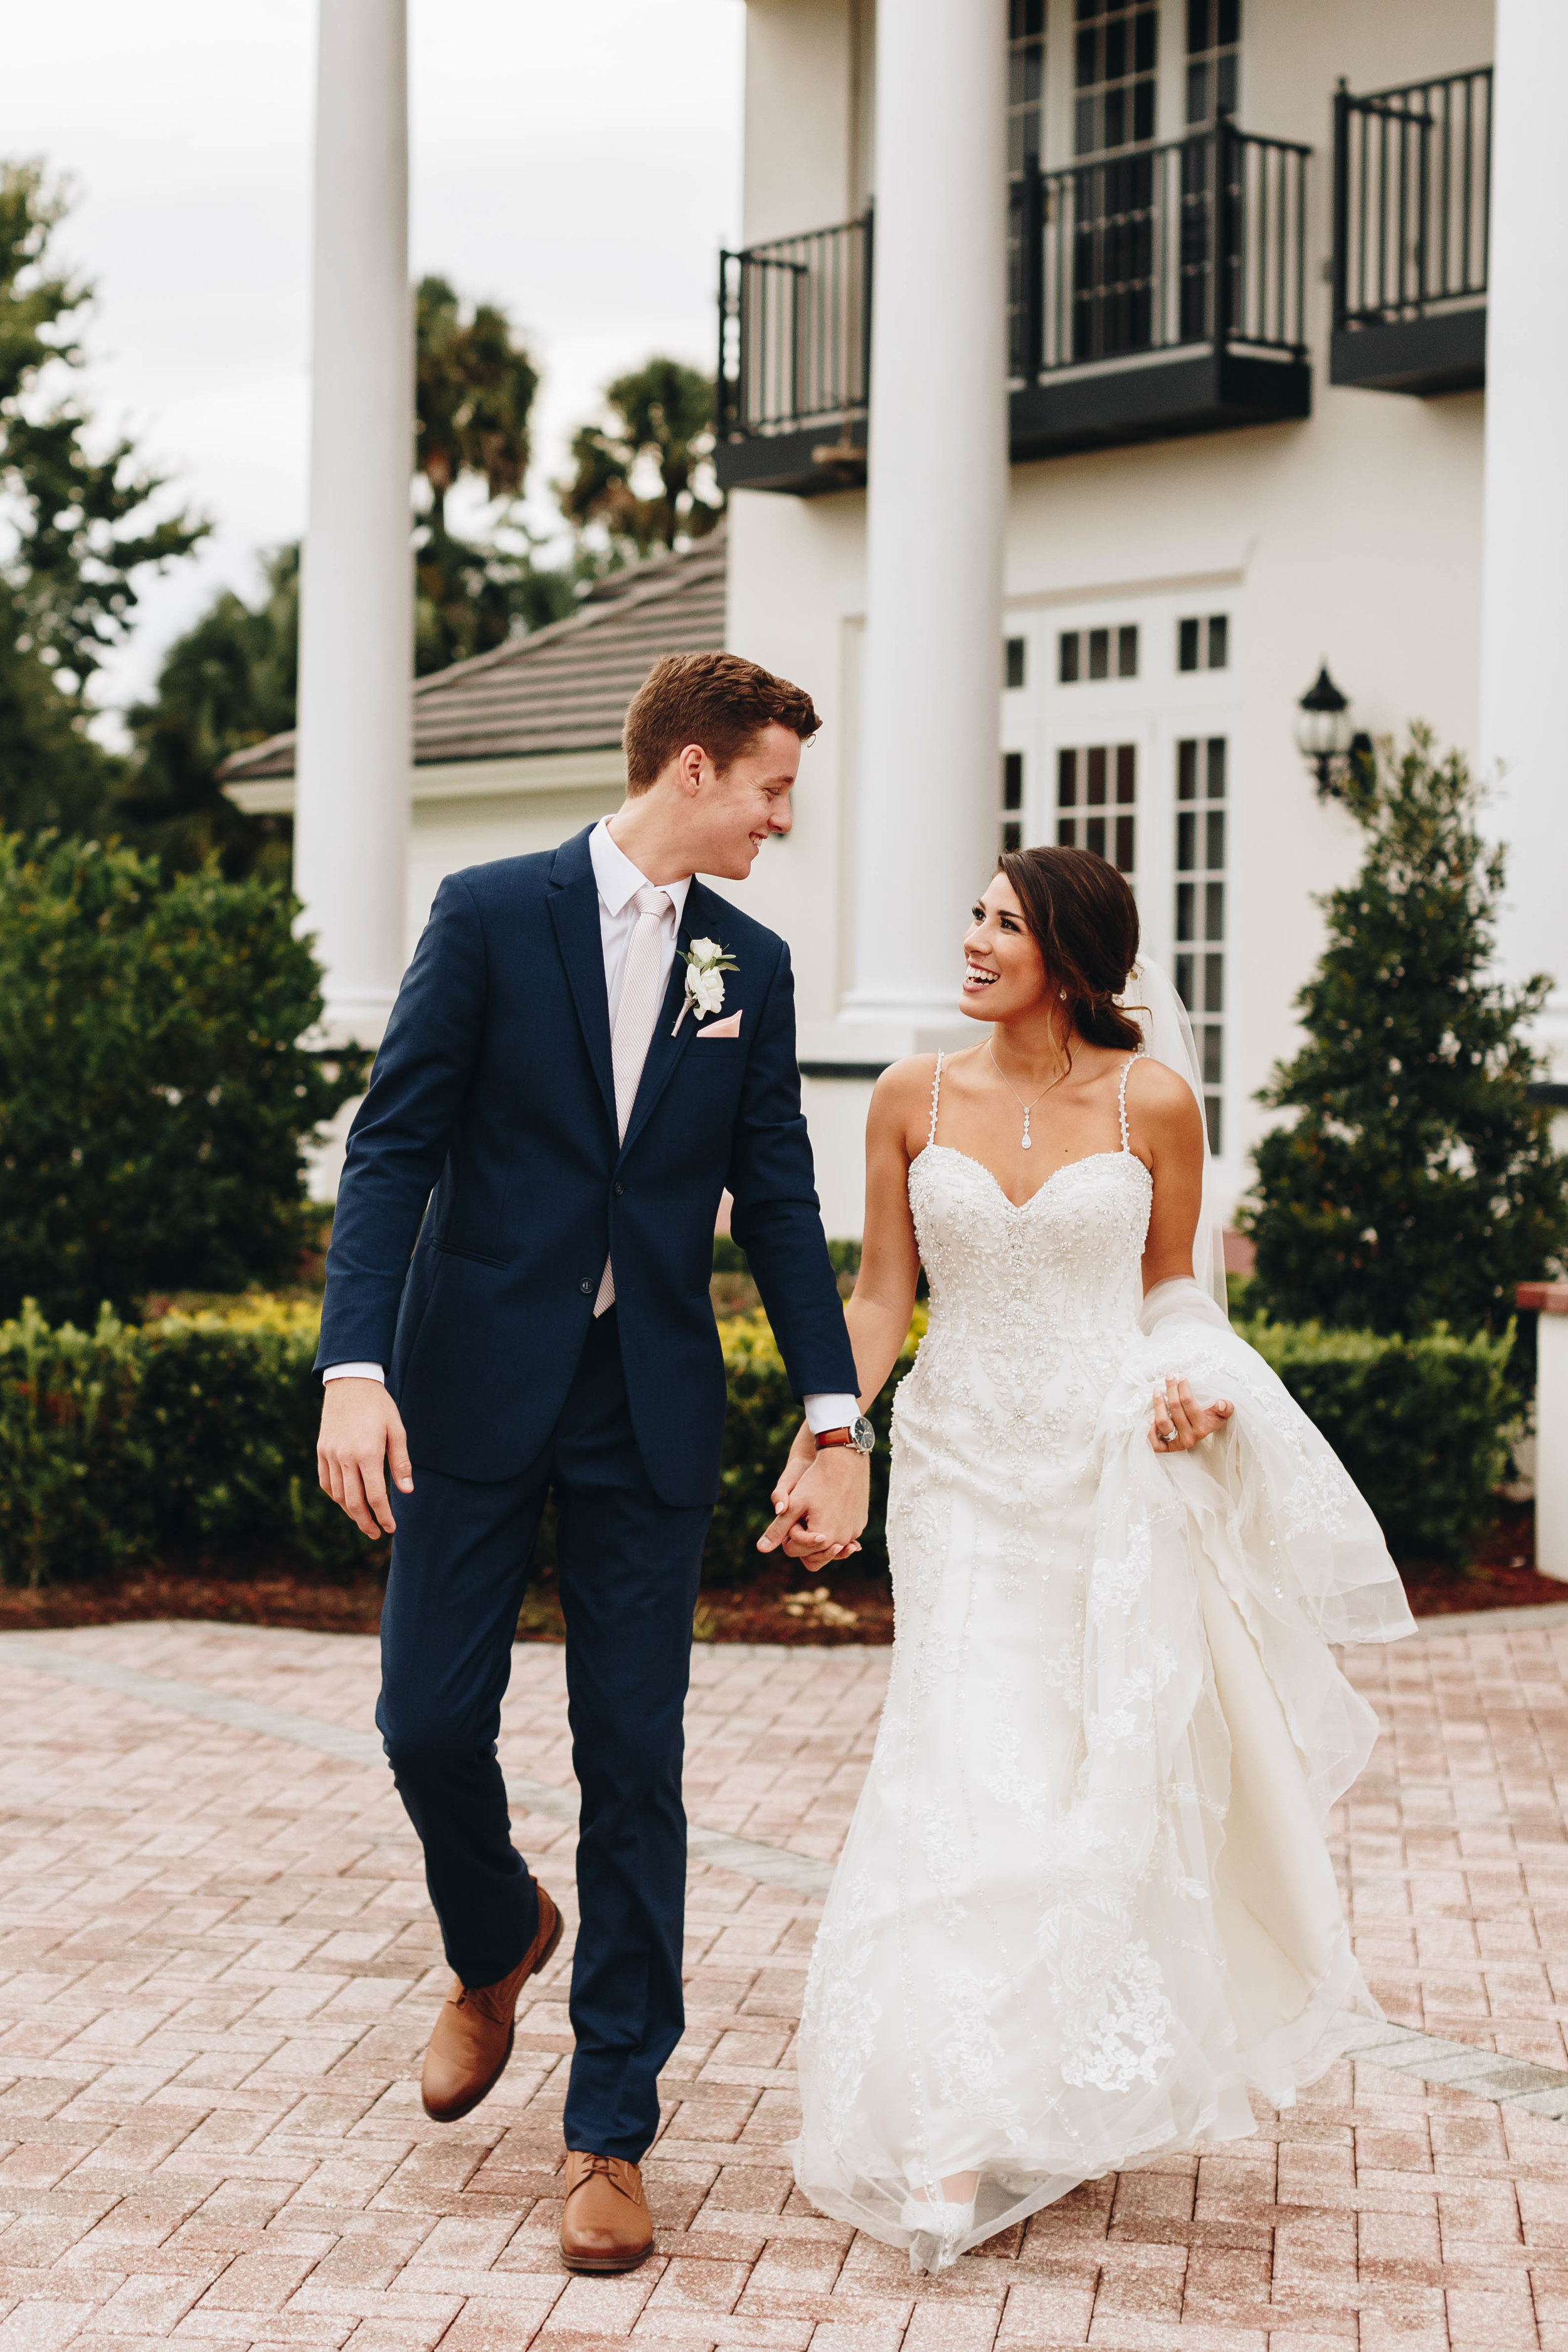 3602d-luxmoregrandestatewedding.jpgluxmoregrandestatewedding.jpg